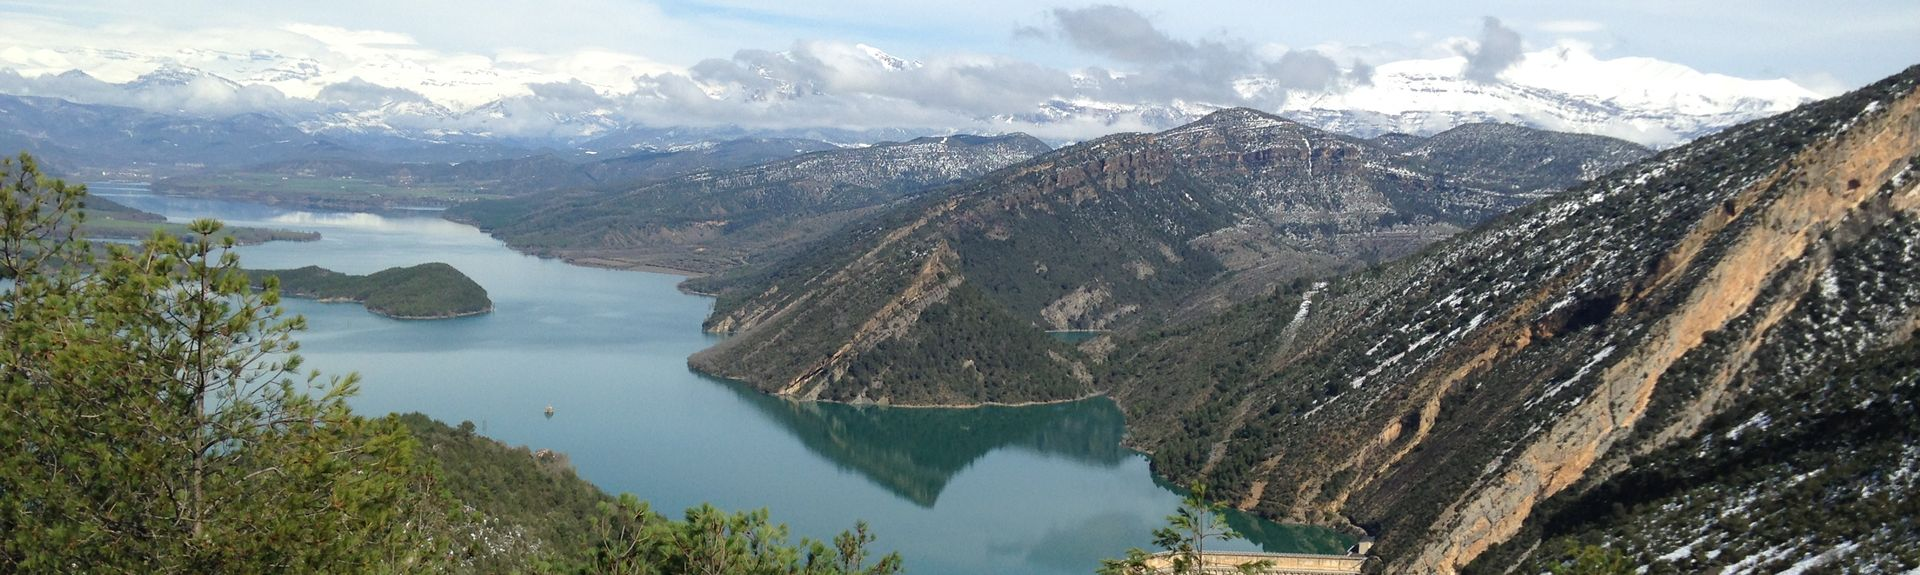 La Pardina, Huesca, Spain